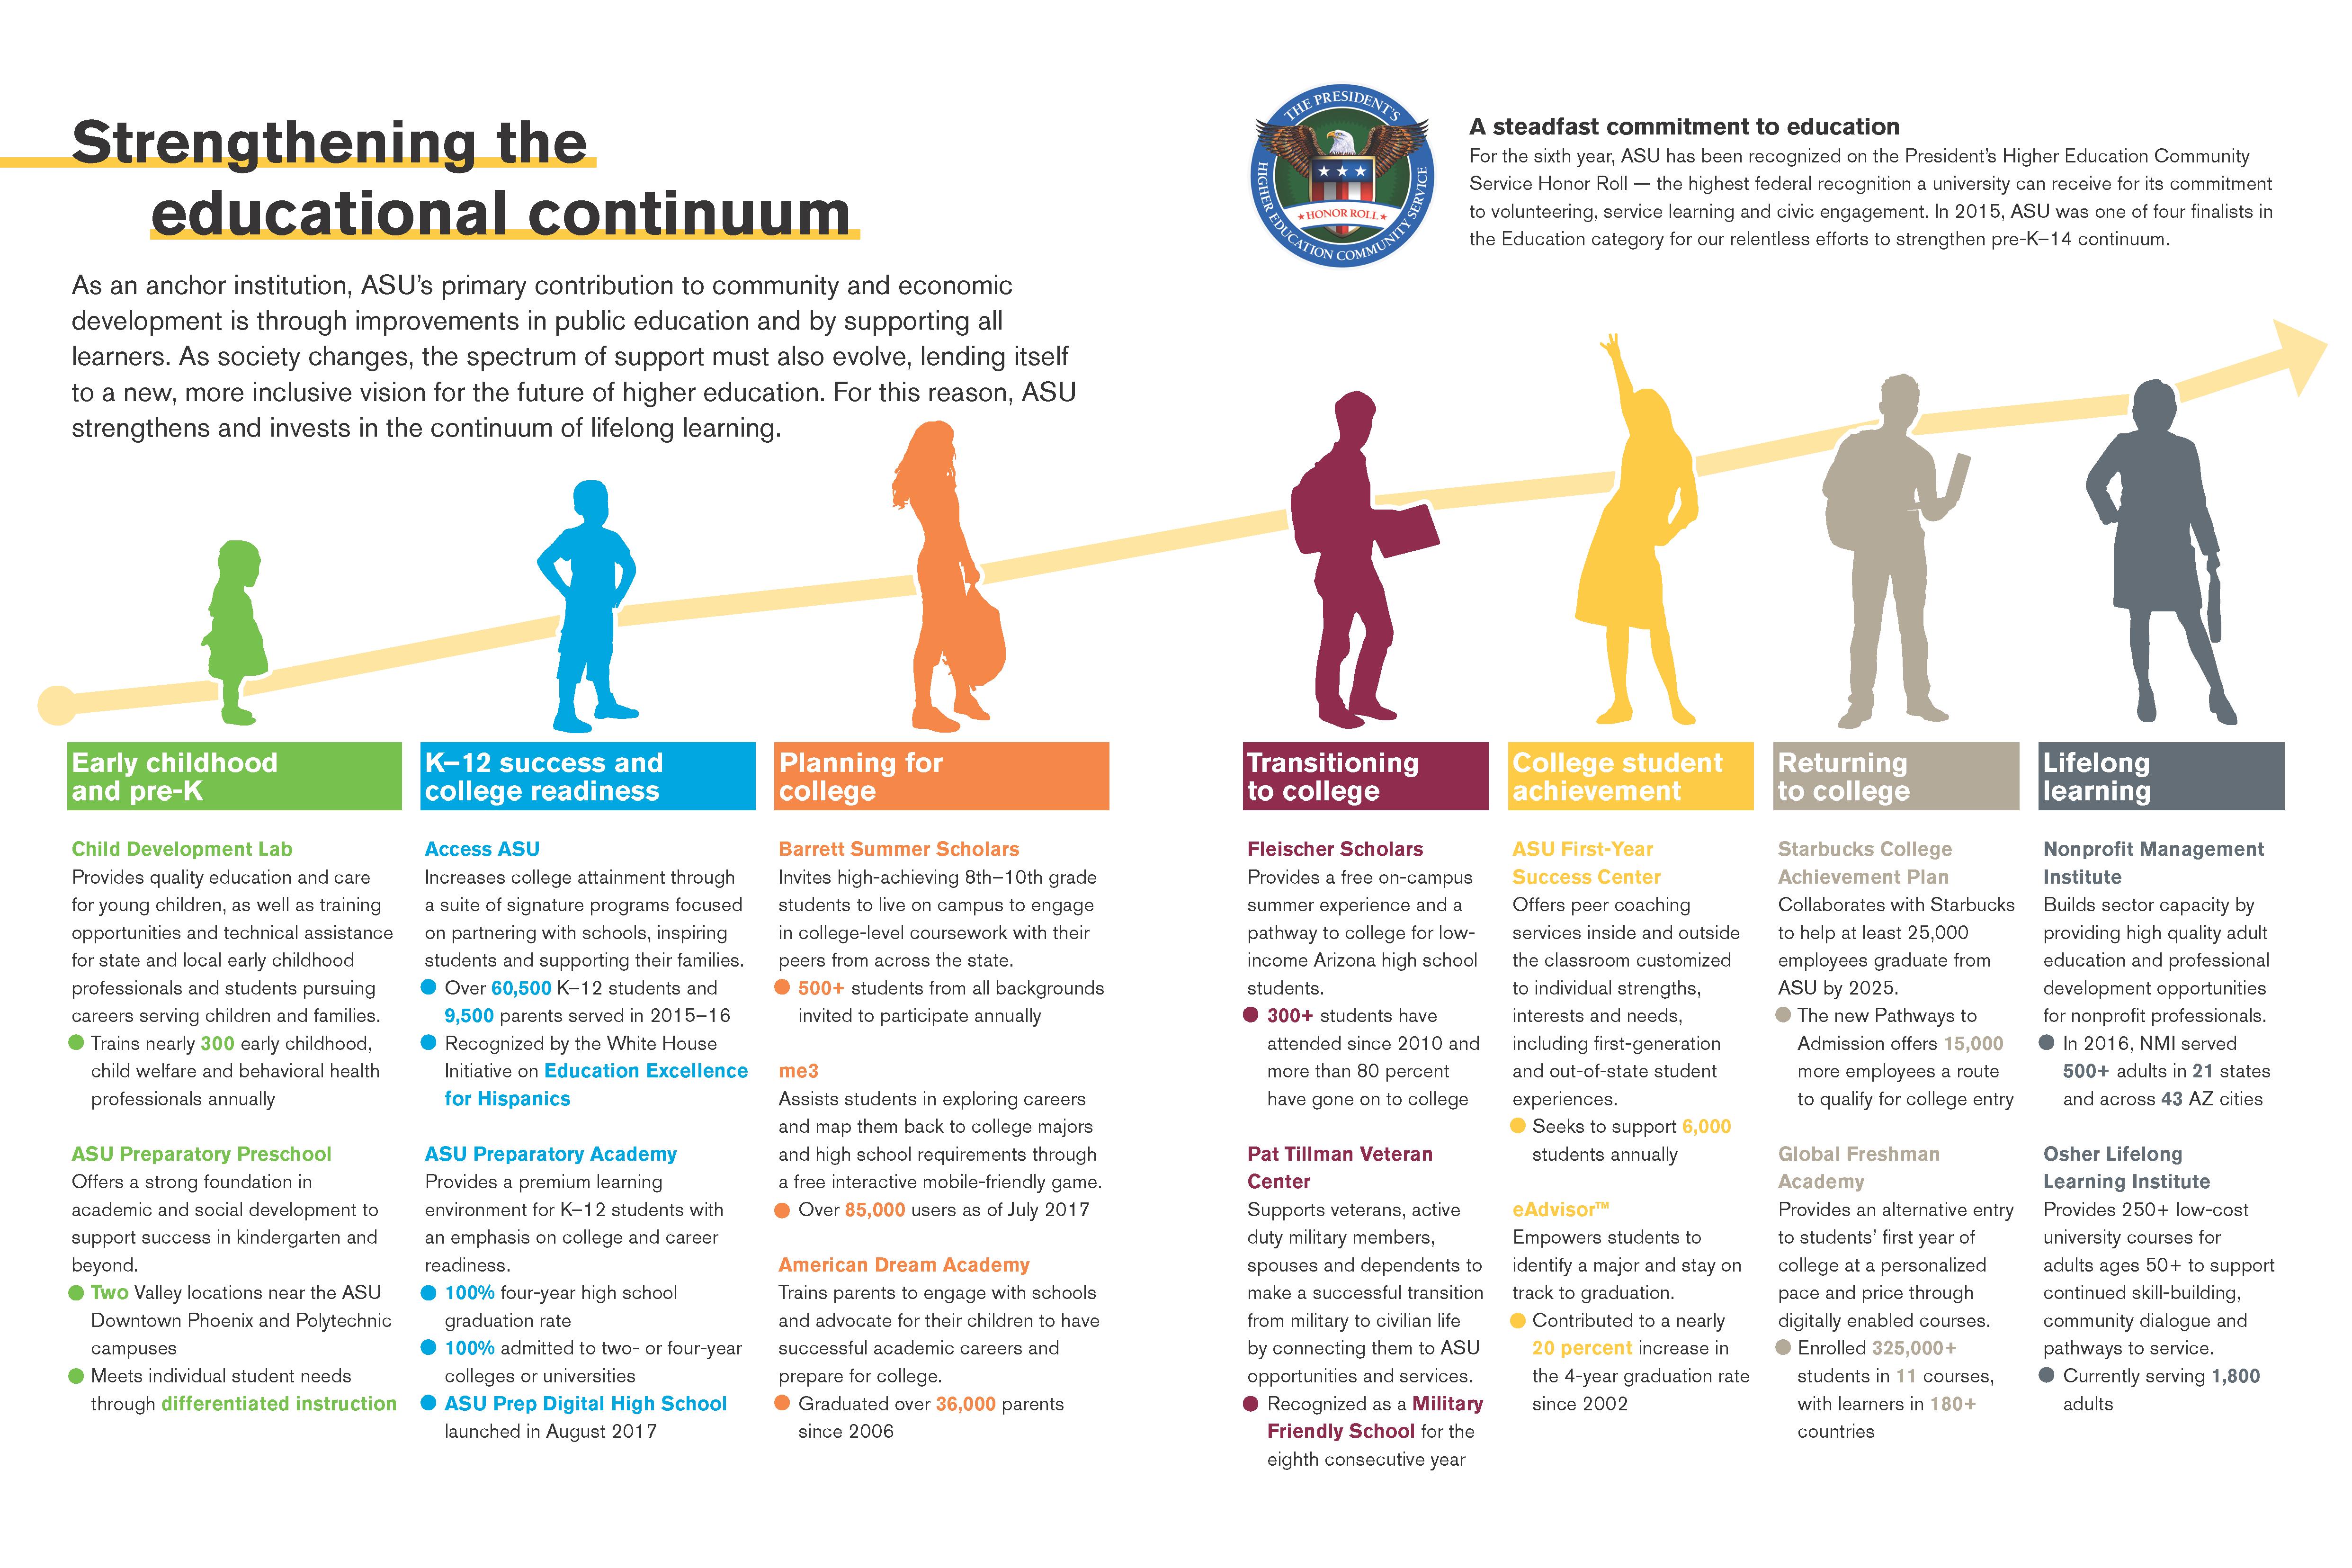 Social Embeddedness Report 2017 - Educational Continuum